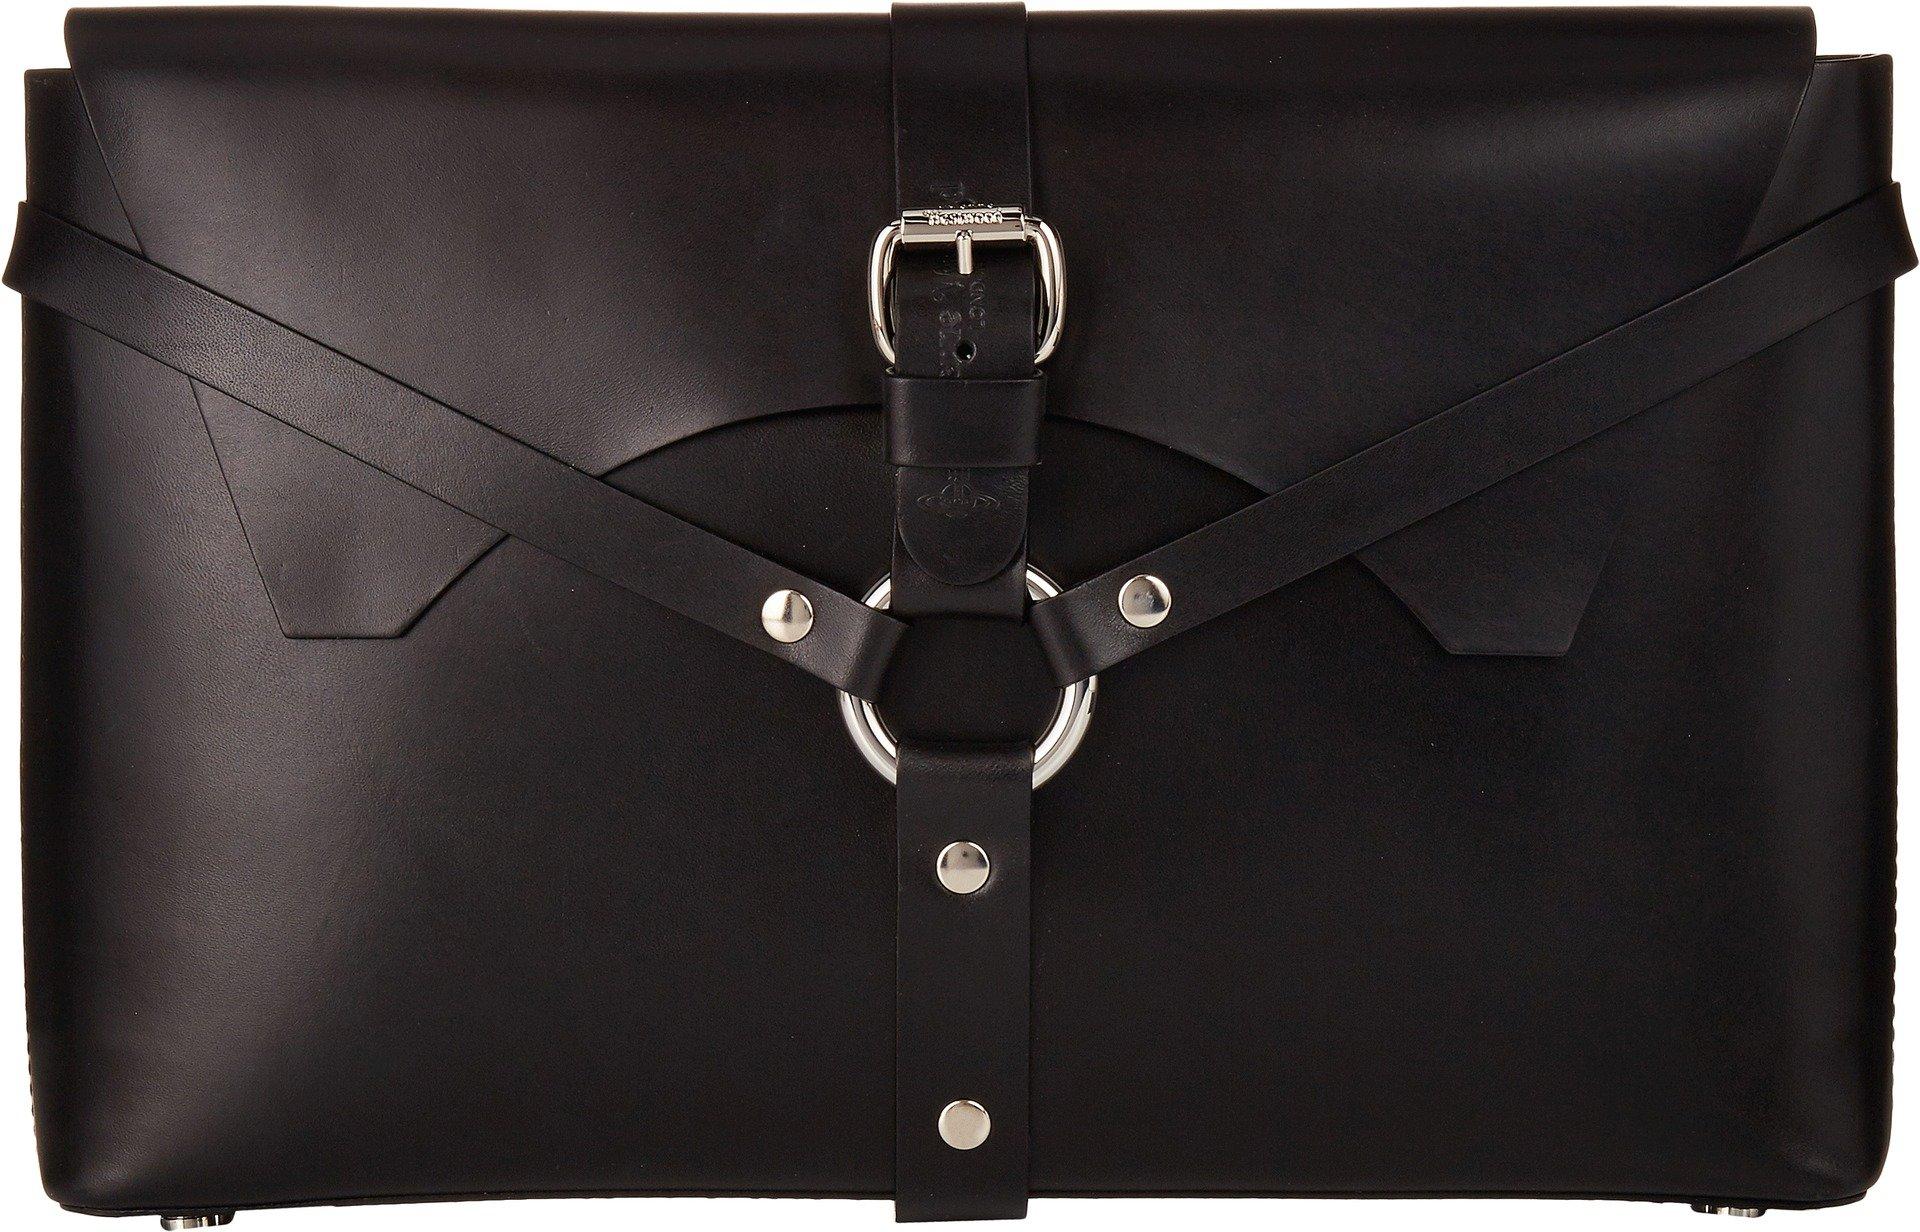 Vivienne Westwood Women's Betty Clutch Black One Size by Vivienne Westwood (Image #1)